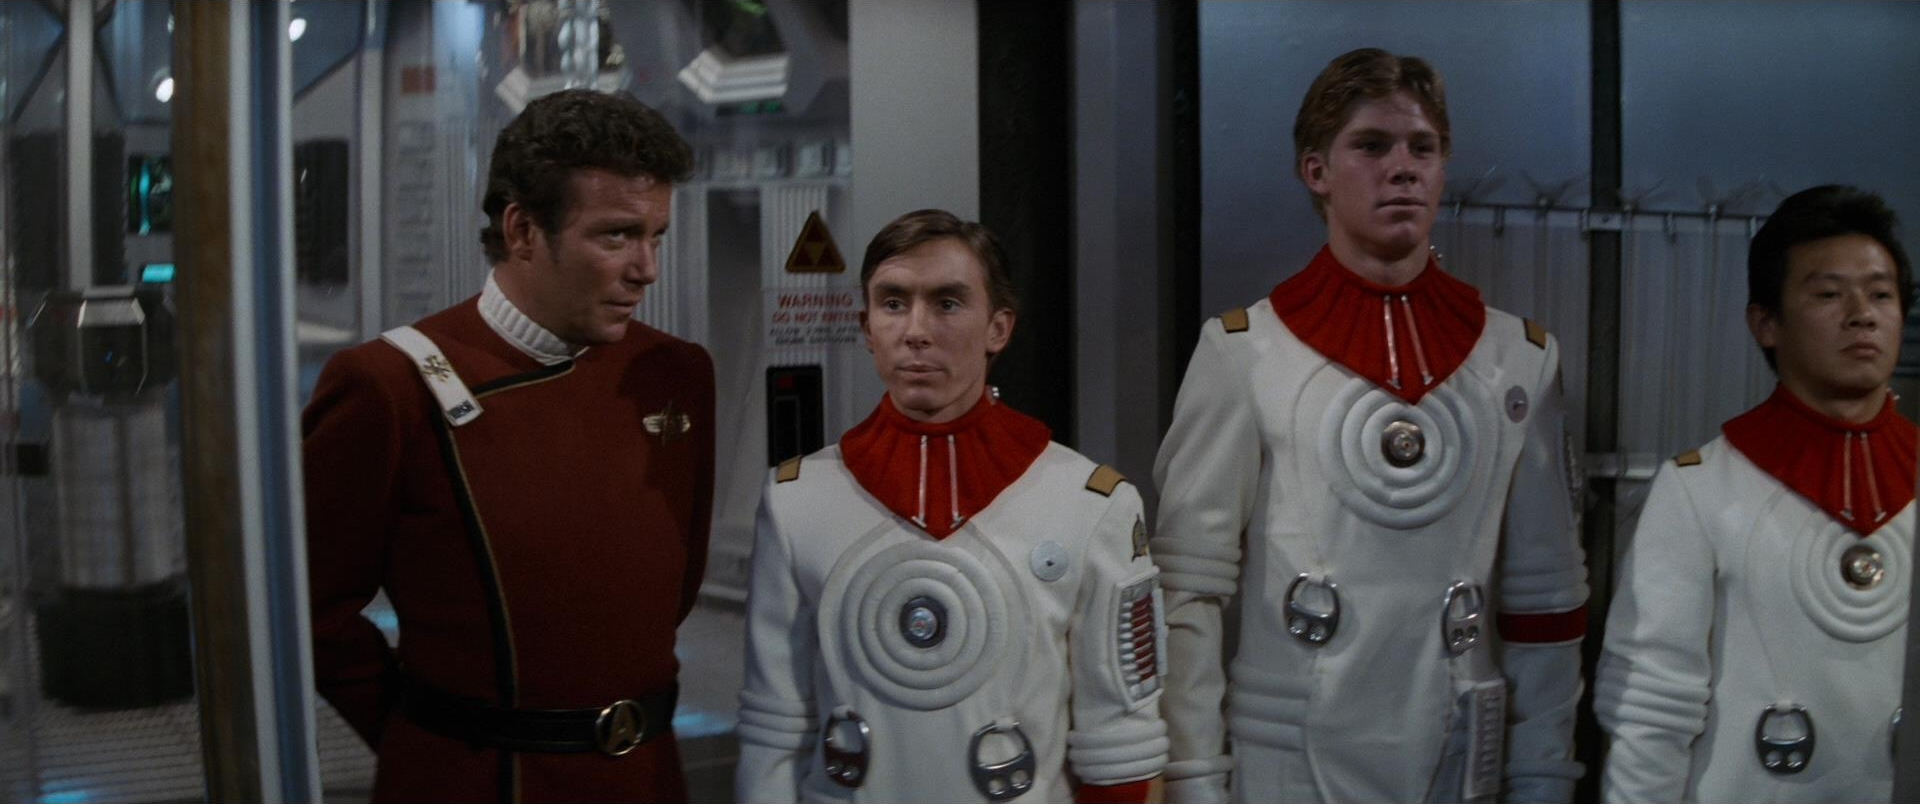 Star Trek: The Wrath of Khan - Kirk & Preston